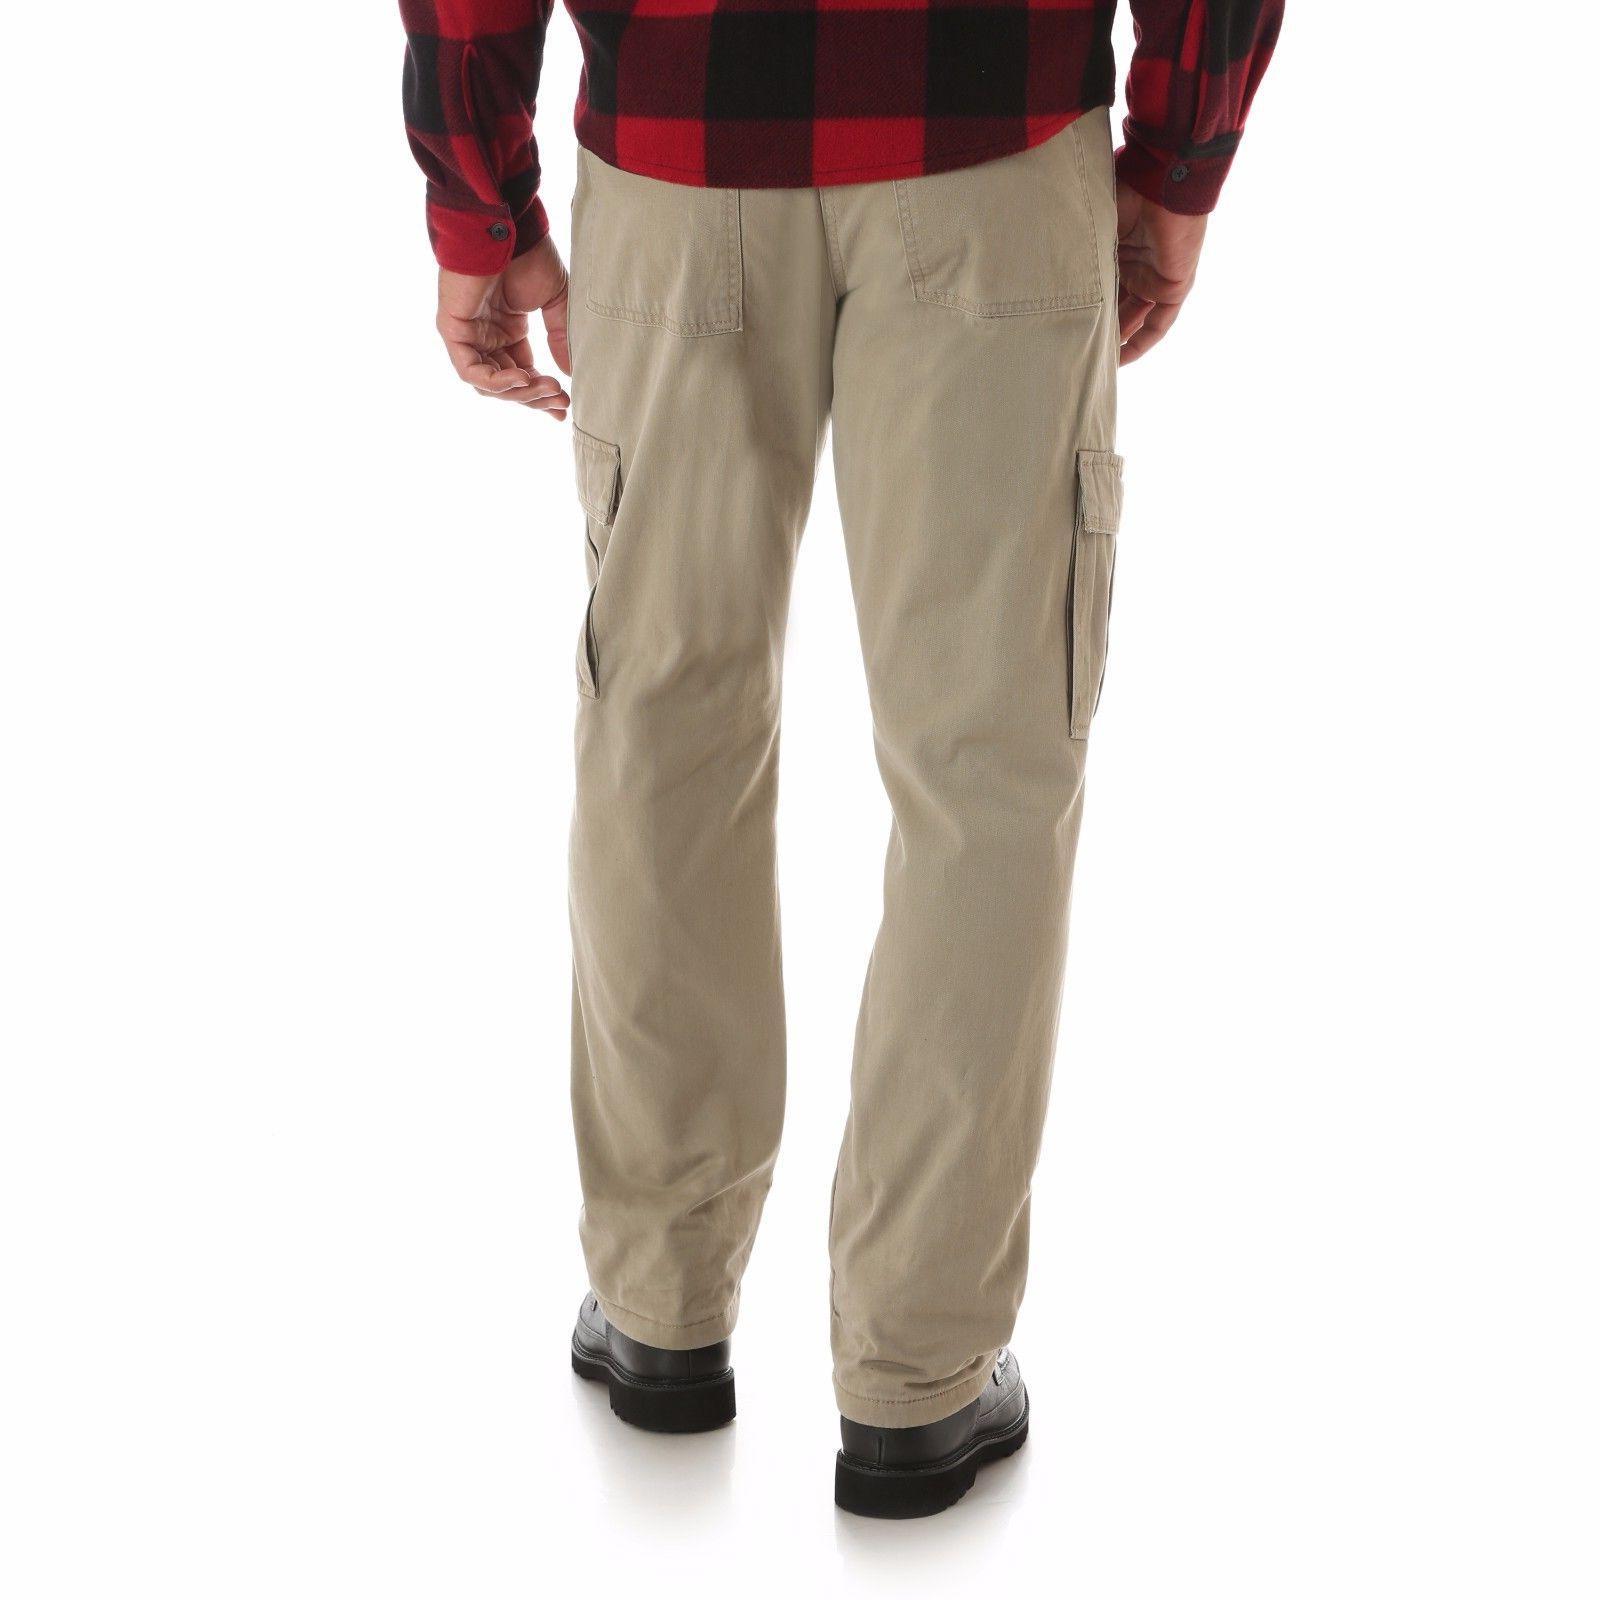 Wrangler Fleece Cargo Pants Relaxed Fit Work Mens